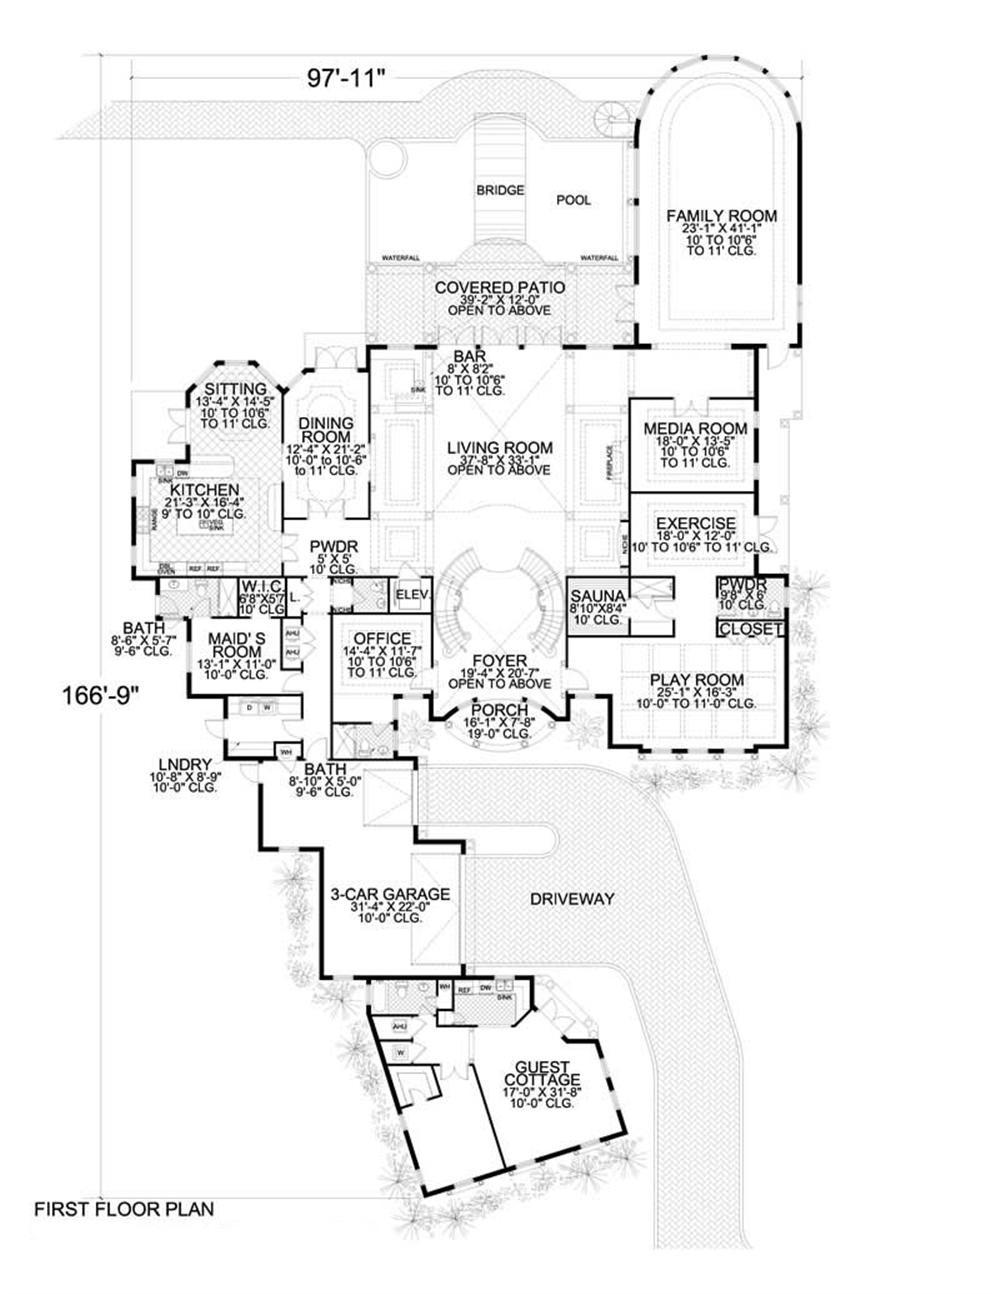 Room Floor Plan Designer Free: 7 Bedrms, 7.5 Baths